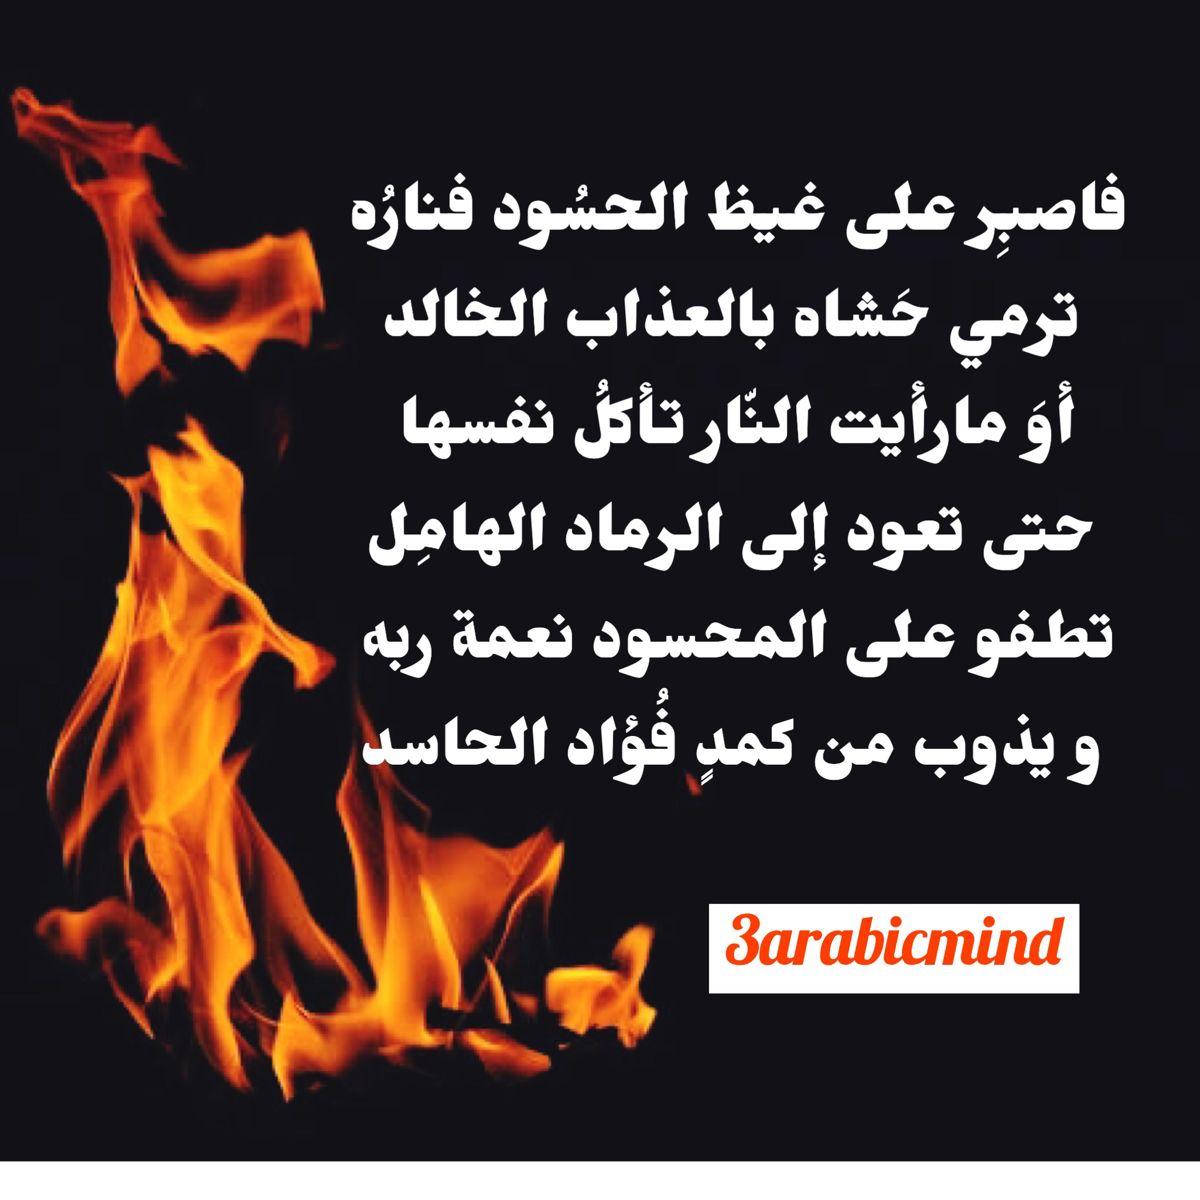 عادل المحلاوي Adelalmhlawi Twitter Thankful Islam